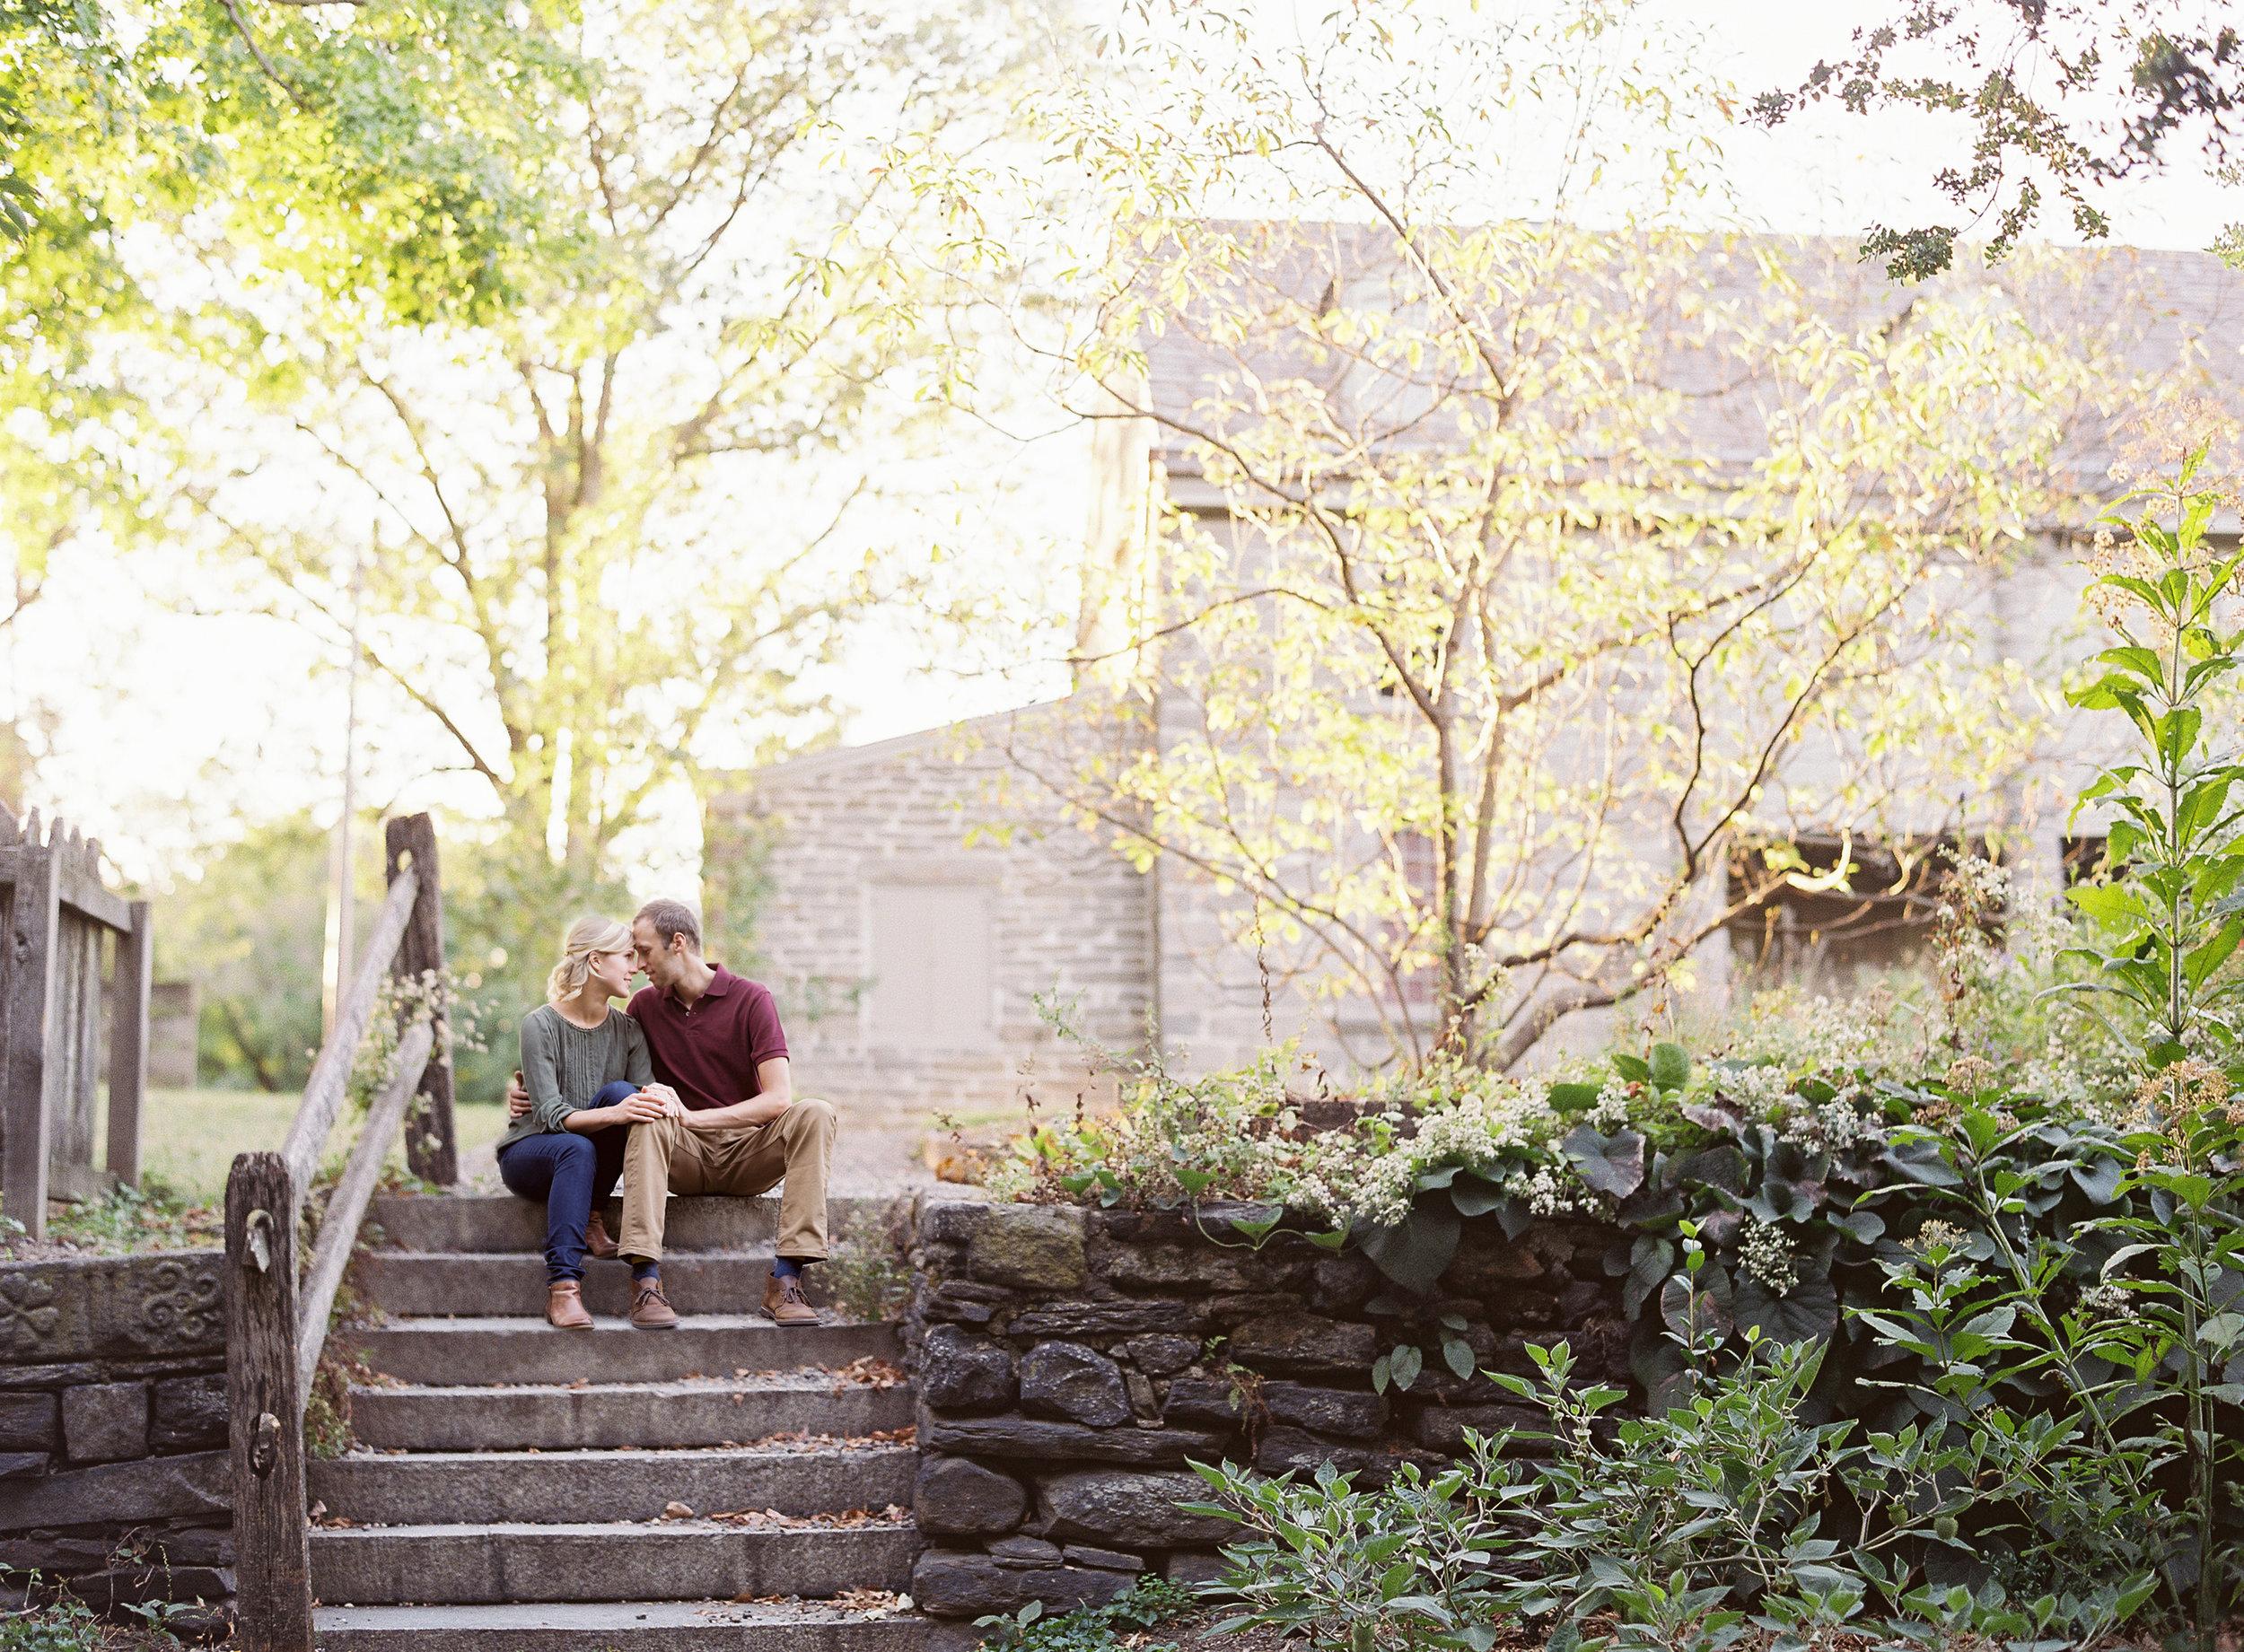 Meghan Mehan Photography | Fine Art Film Wedding Photographer | California | San Francisco | Napa | Sonoma | Santa Barbara | Big Sur | Los Angeles | Destination Wedding Photographer 028.jpg